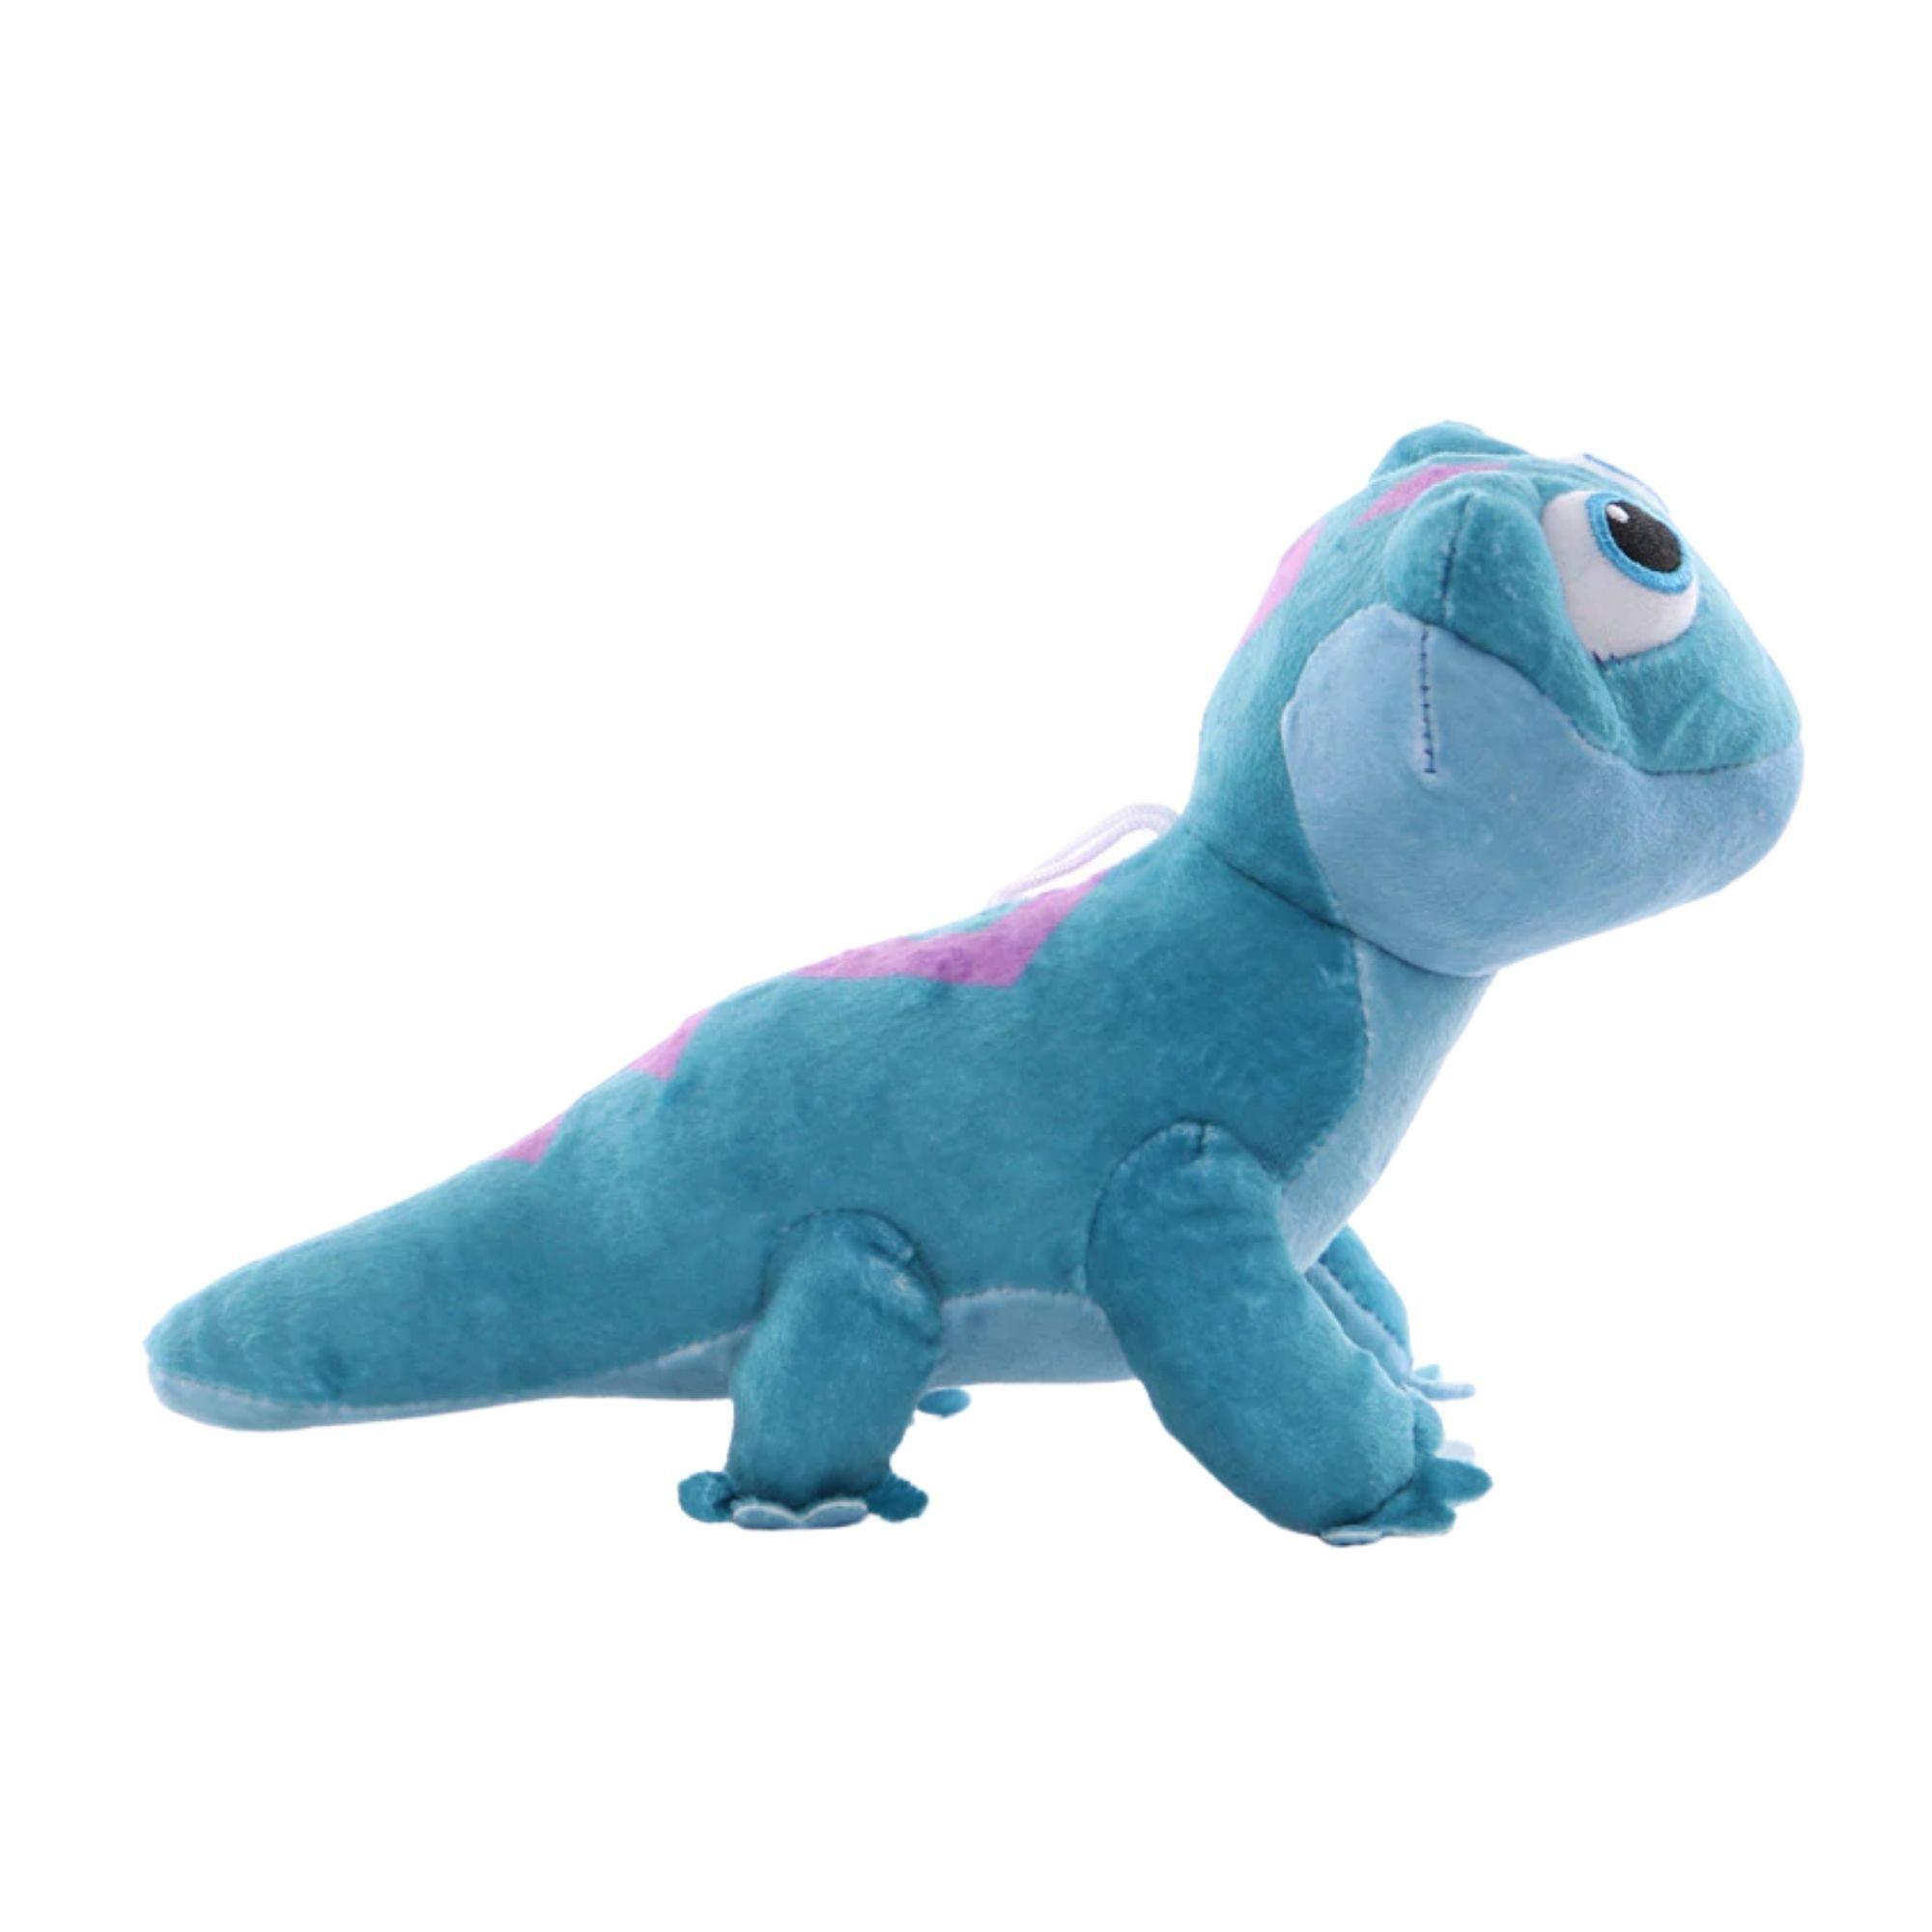 Pelucia Salamandra Bruni do Filme Frozen 2 Mascote da Elsa  - Game Land Brinquedos